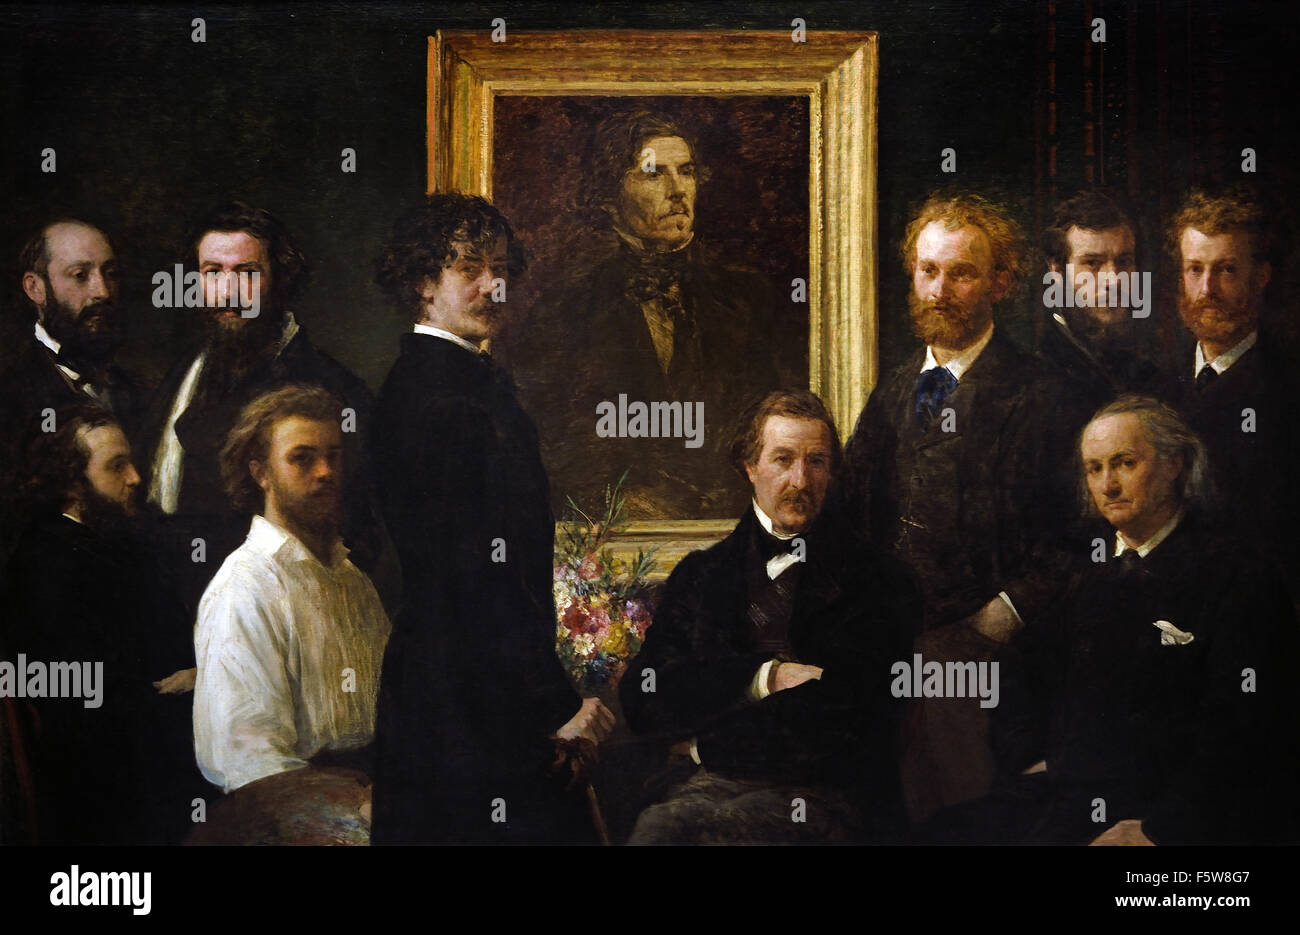 Hommage à ( Tribute to ) Delacroix 1864 Henri Fantin Latour 1836-1904 France French - Stock Image